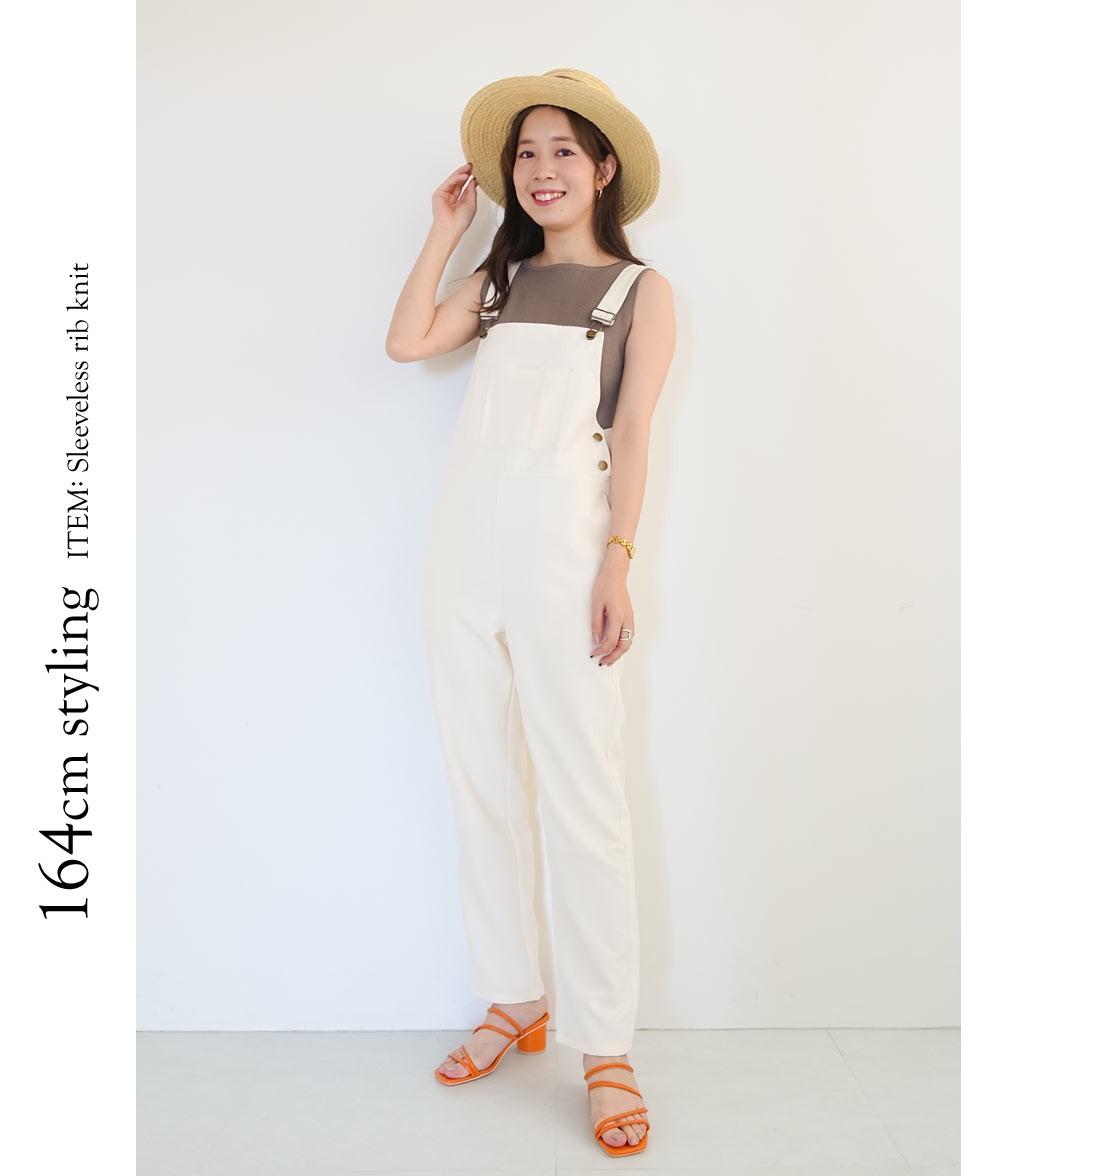 164cm styling ITEM: Sleeveless rib knit